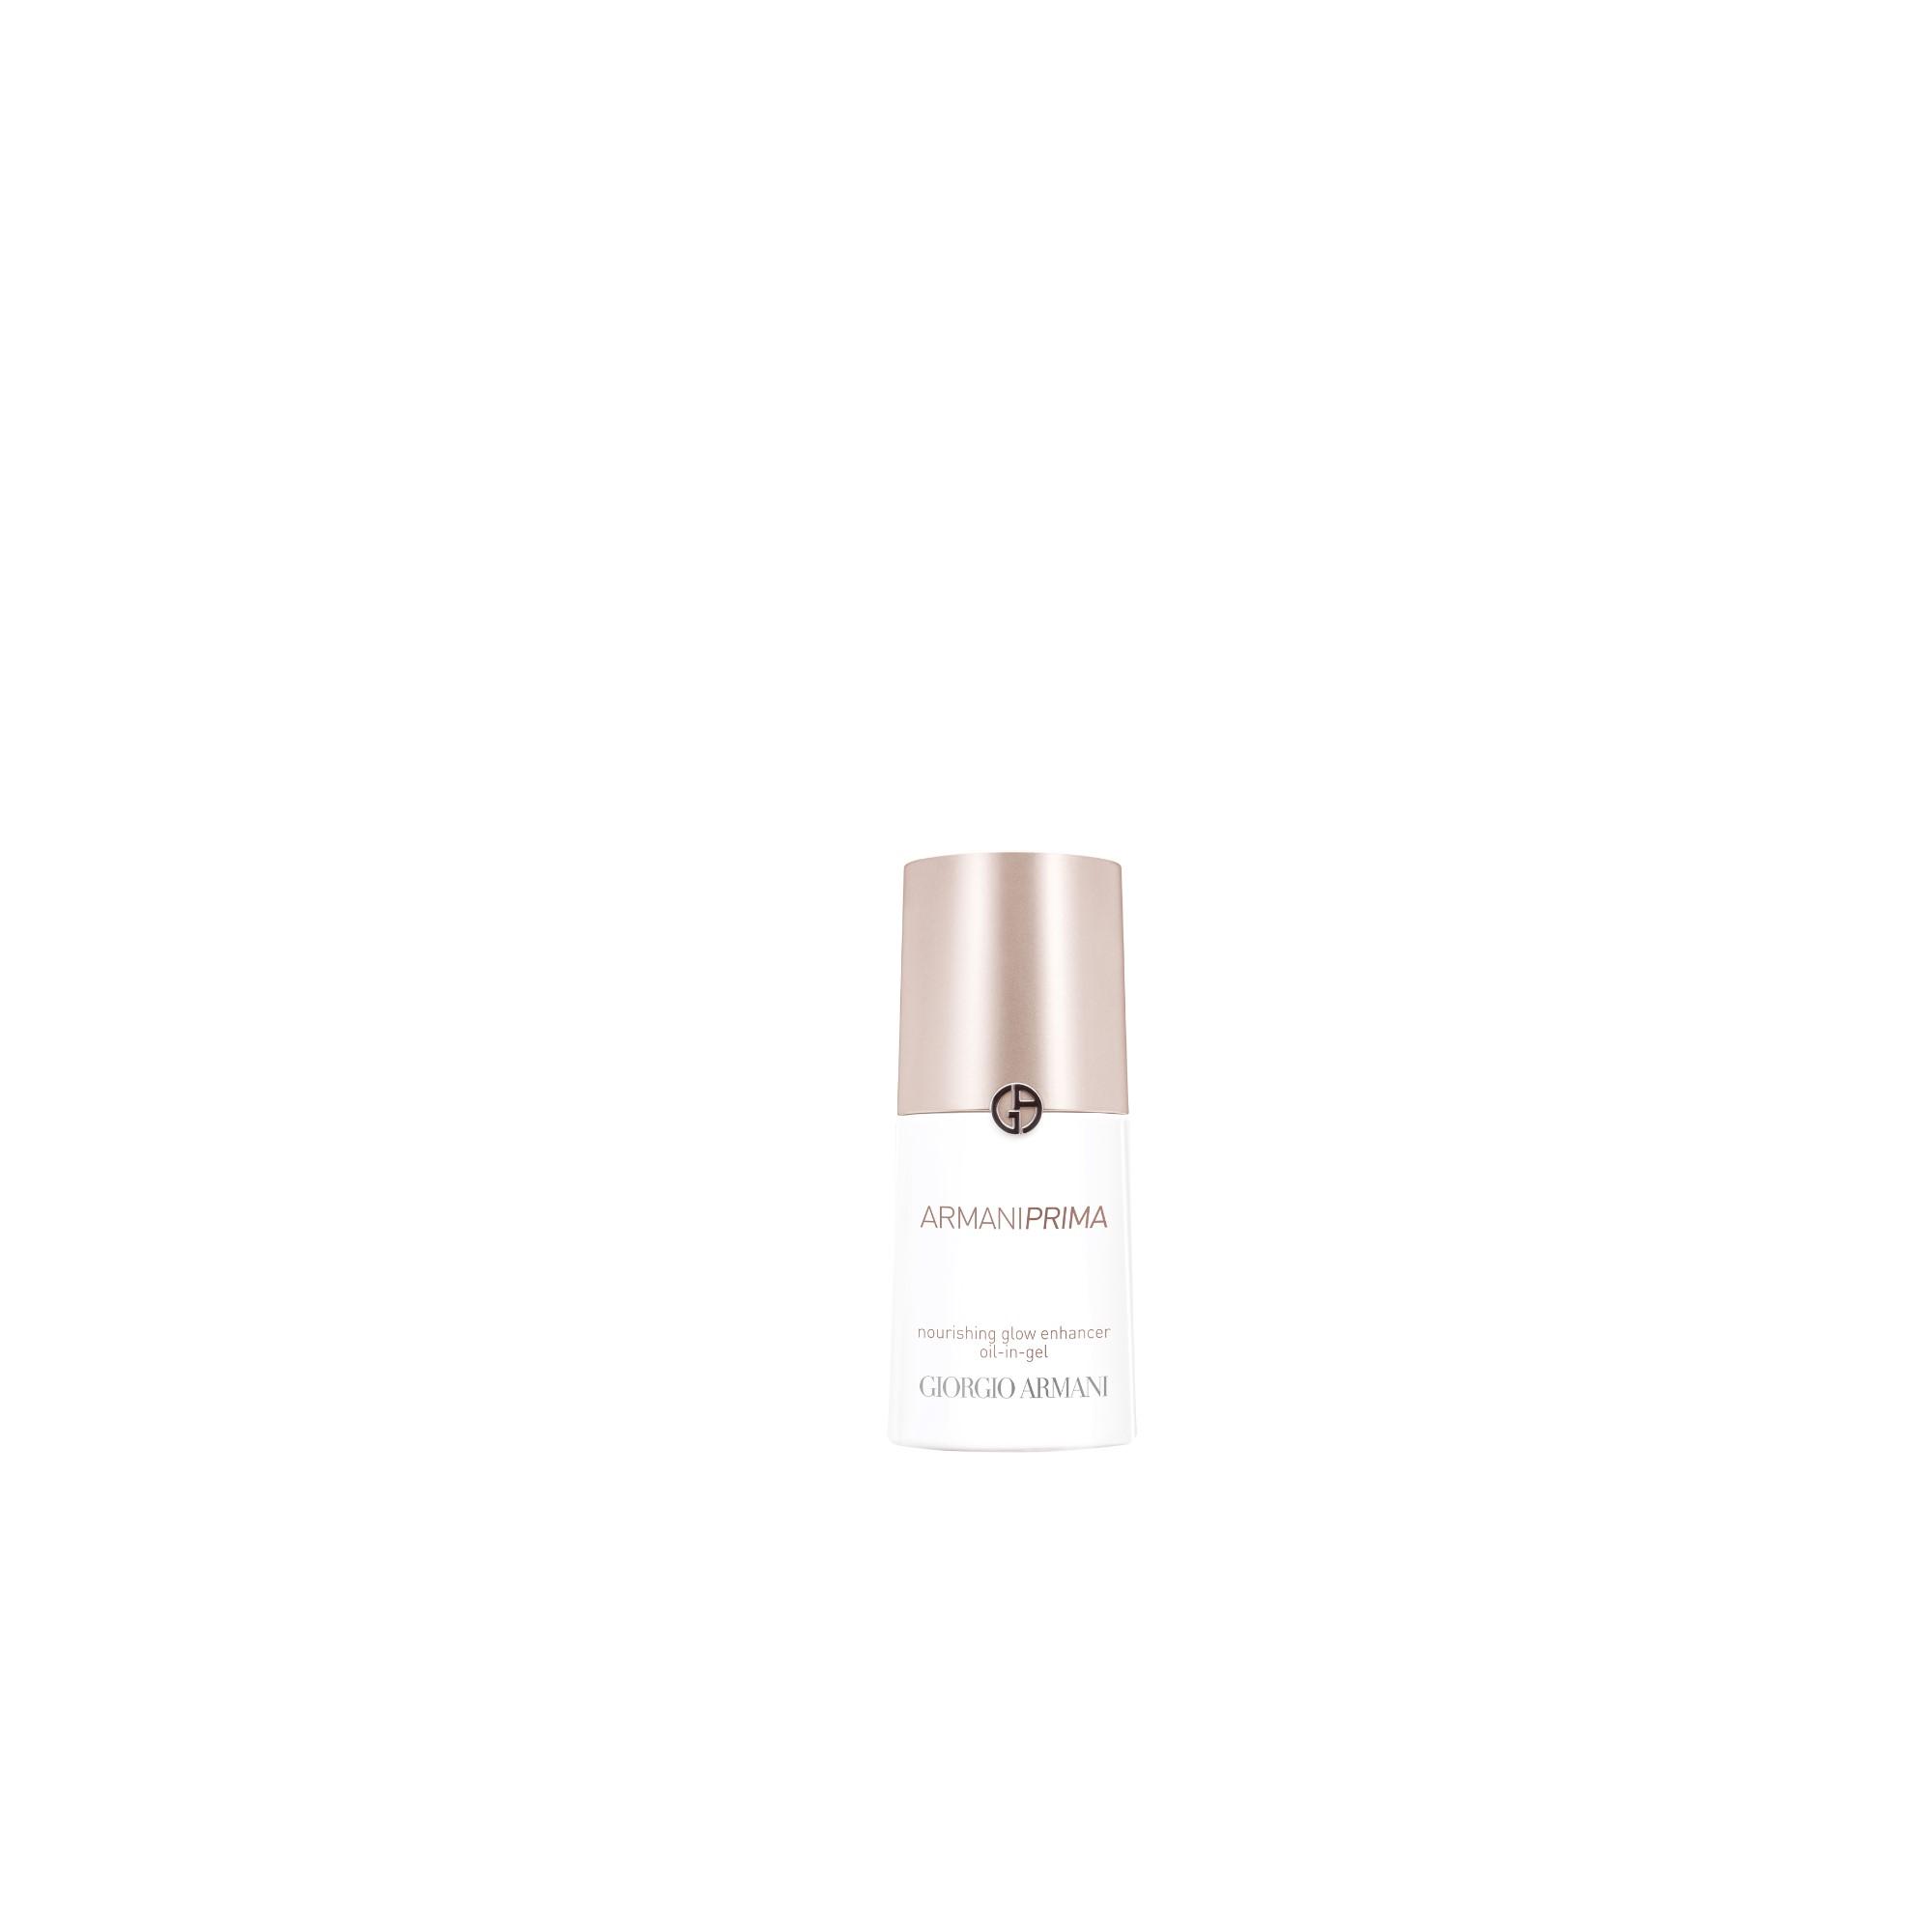 Armani Beauty Prima Glow Enhancer Day Cream 30ml